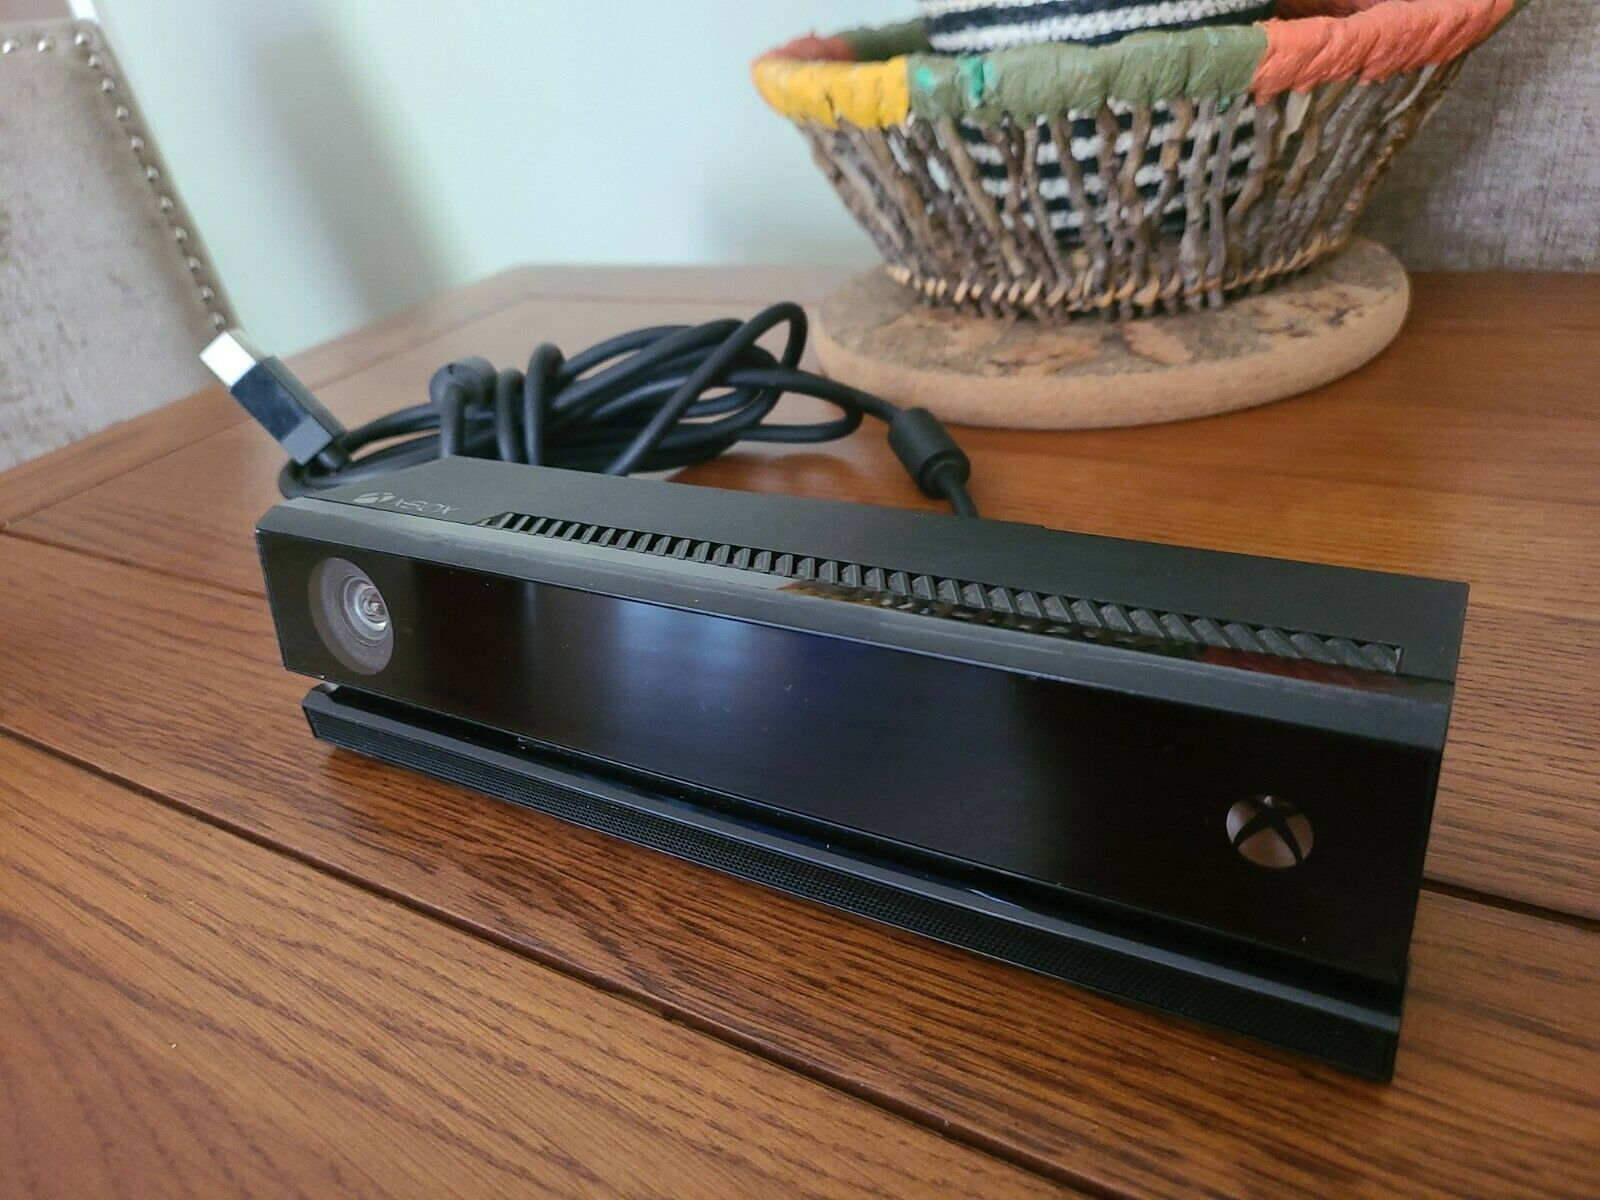 Microsoft Xbox One Kinect 2.0 Sensor Camera UK Seller. Fully Tested Working